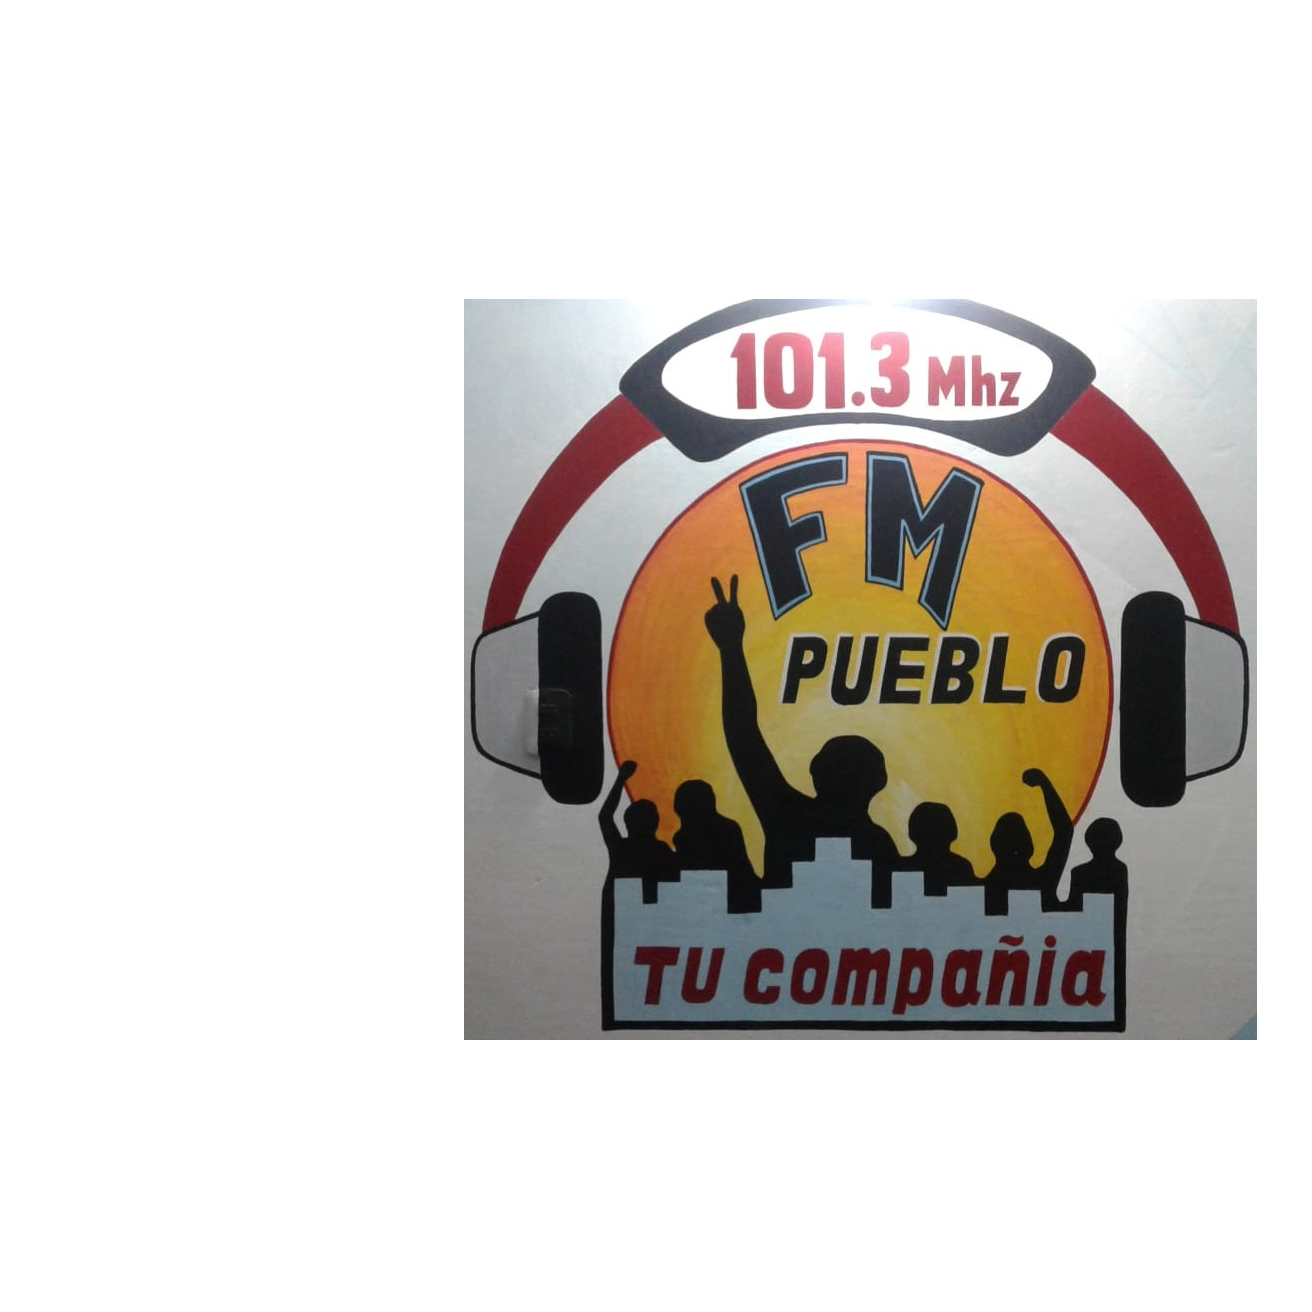 RADIO PUEBLO 101.3